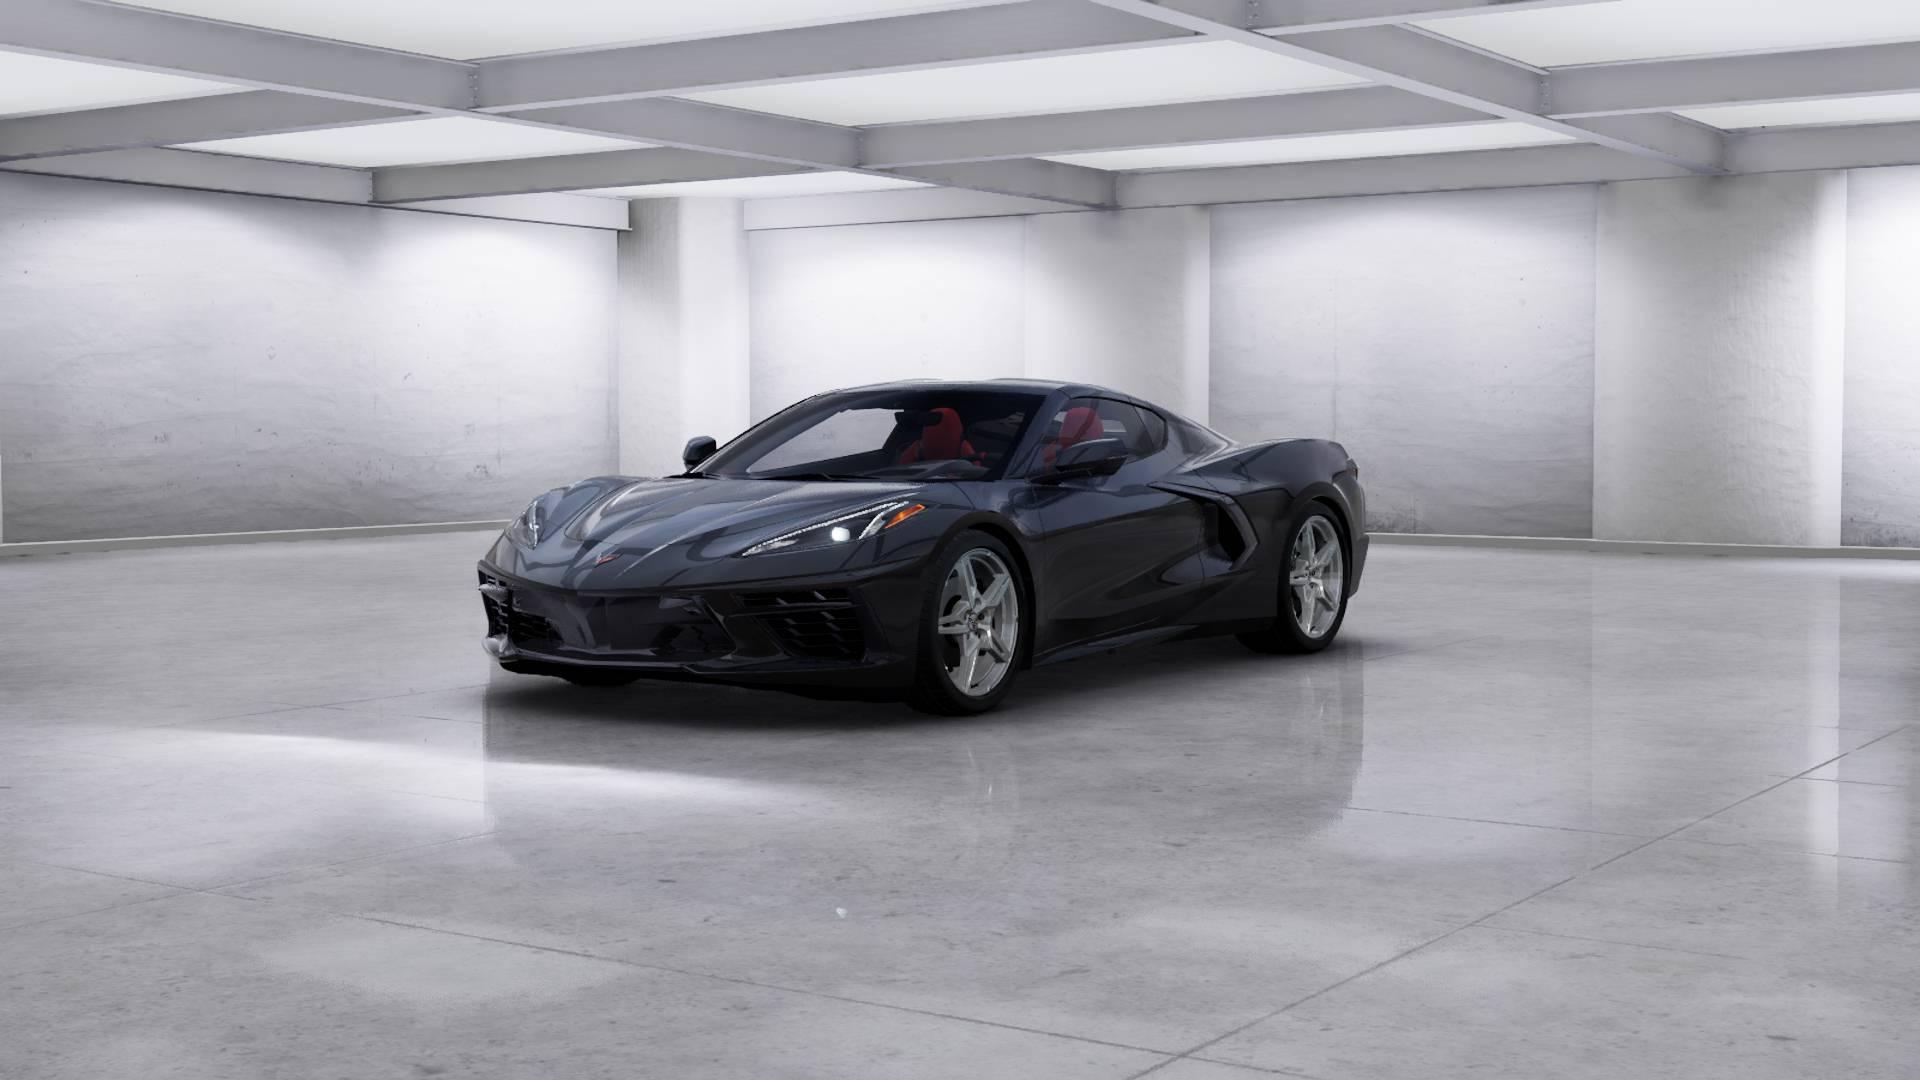 2020 C8 Chevrolet Corvette Stingray: All the Colors ...